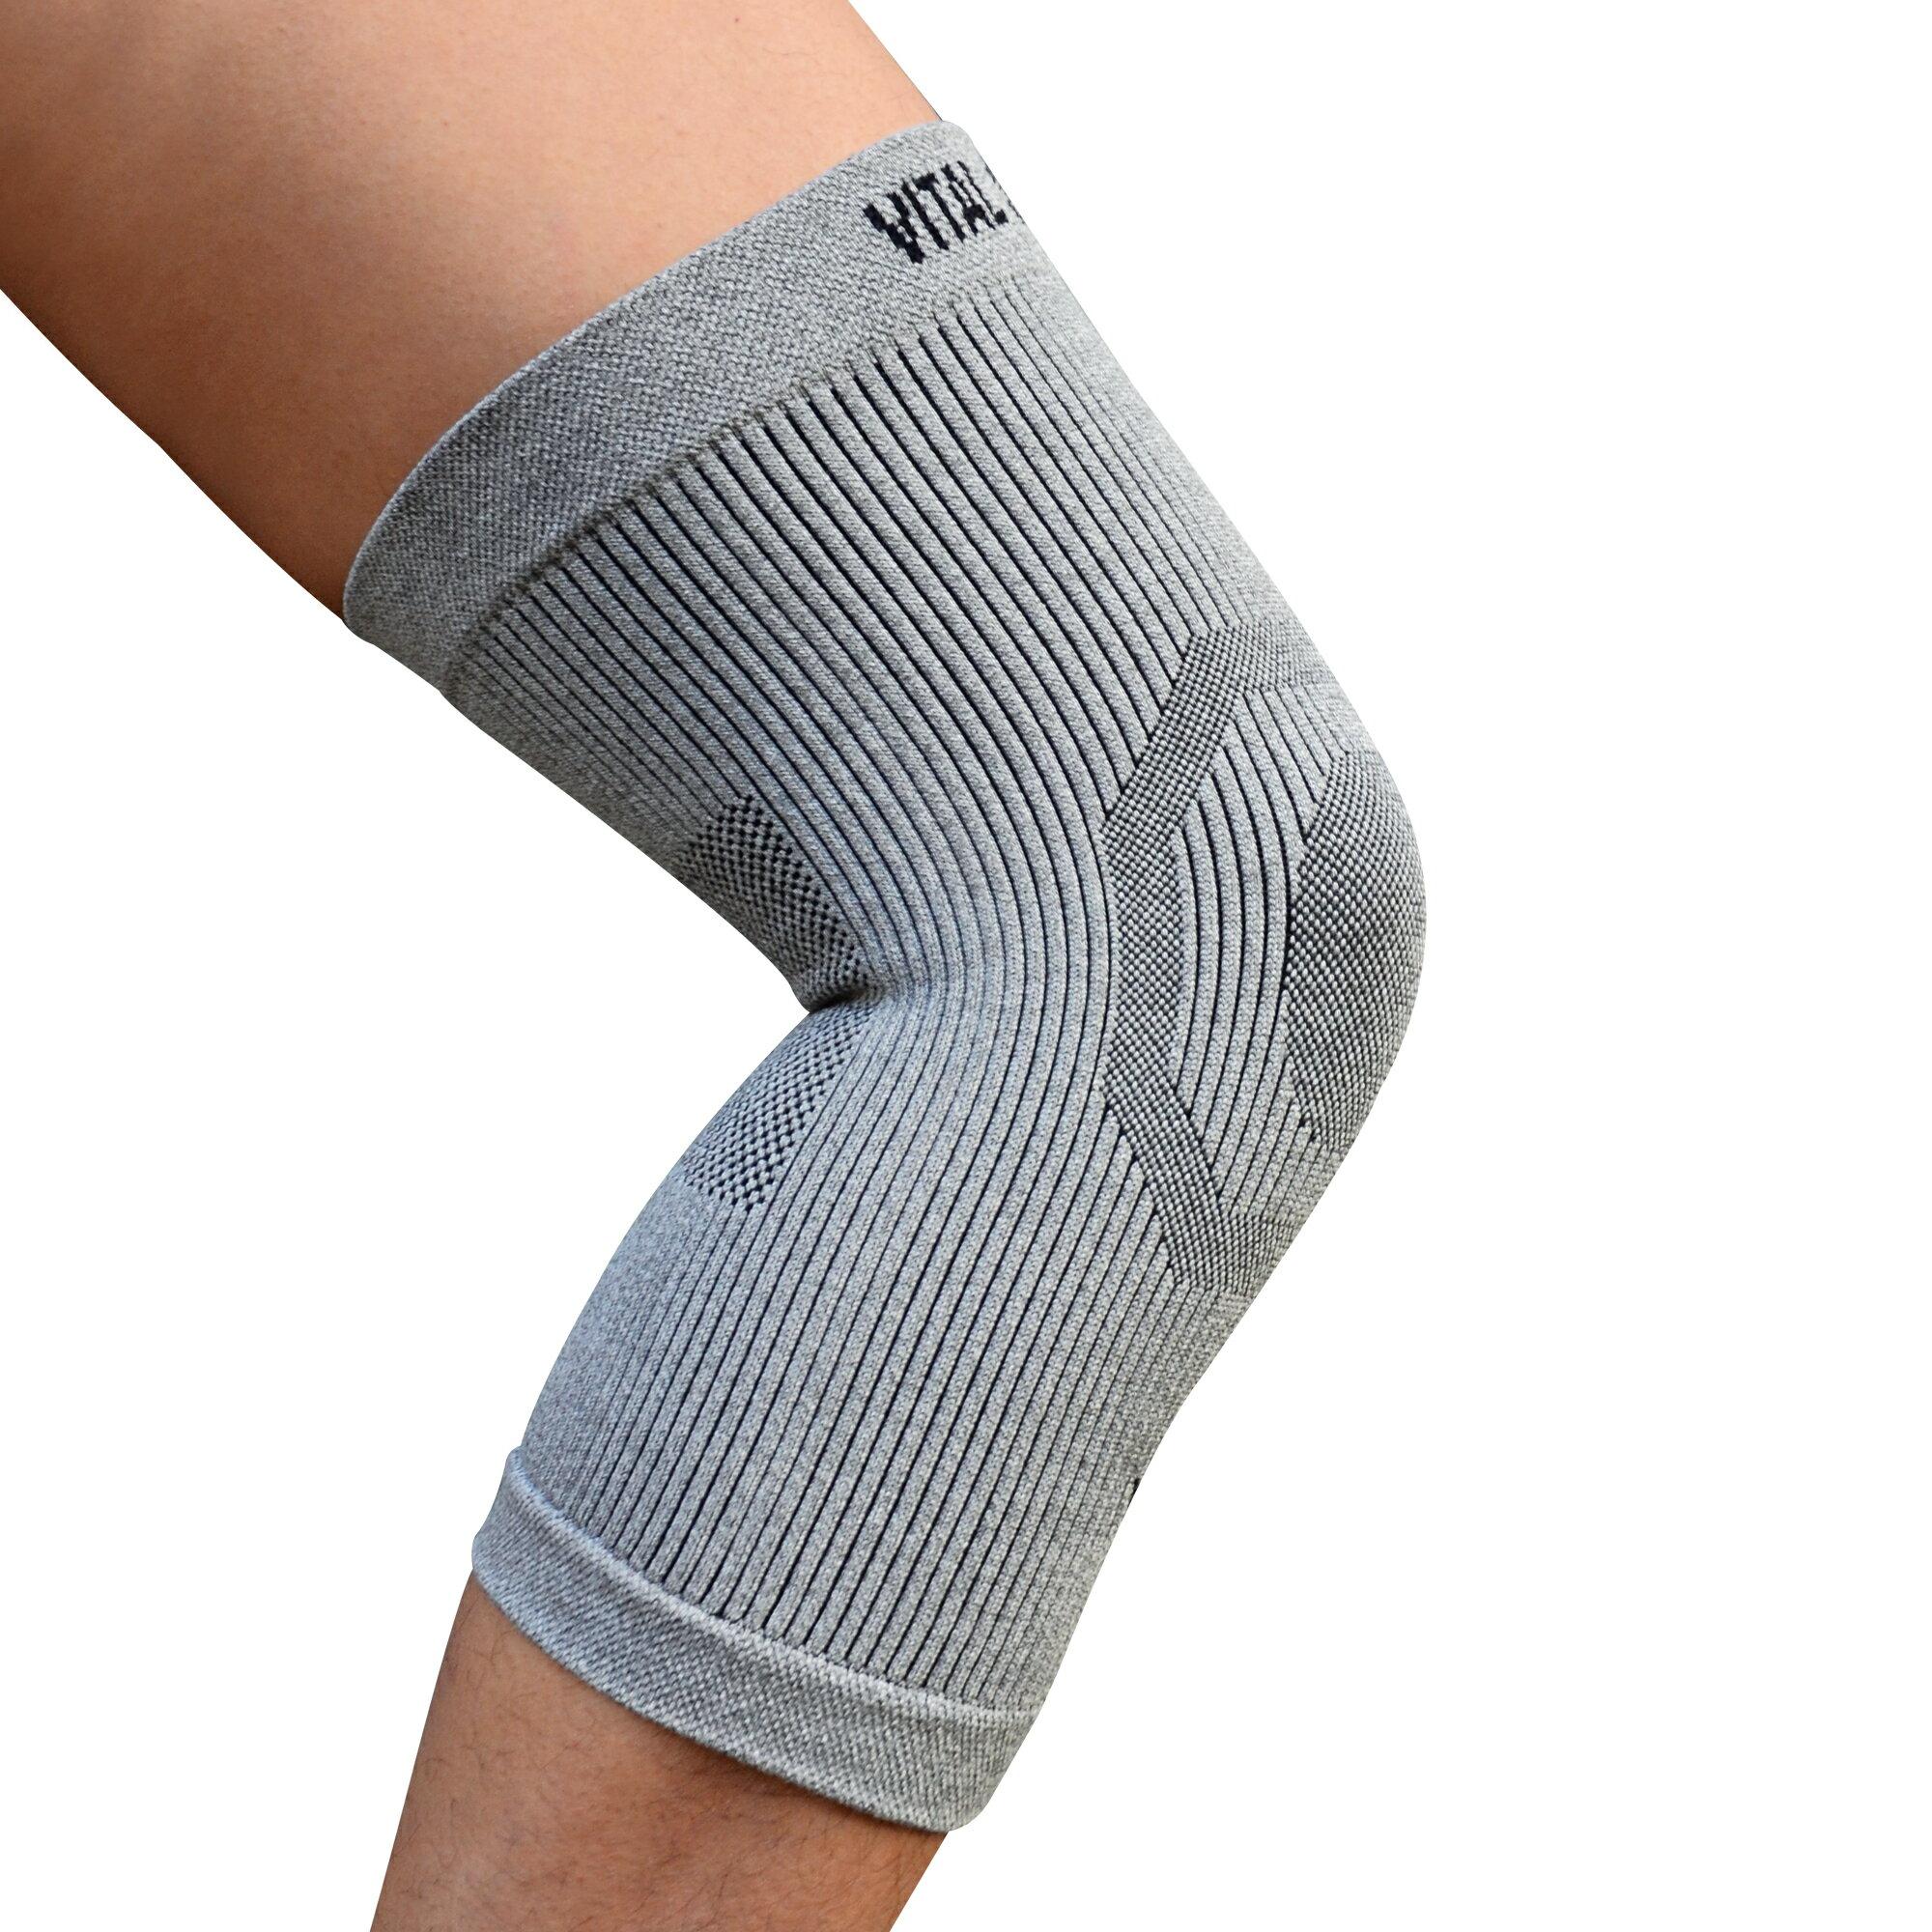 【VITAL SALVEO】運動保健護具 Knee Sleeve C3 防護鍺舒適型護膝(單支)運動防護護具-台灣製造